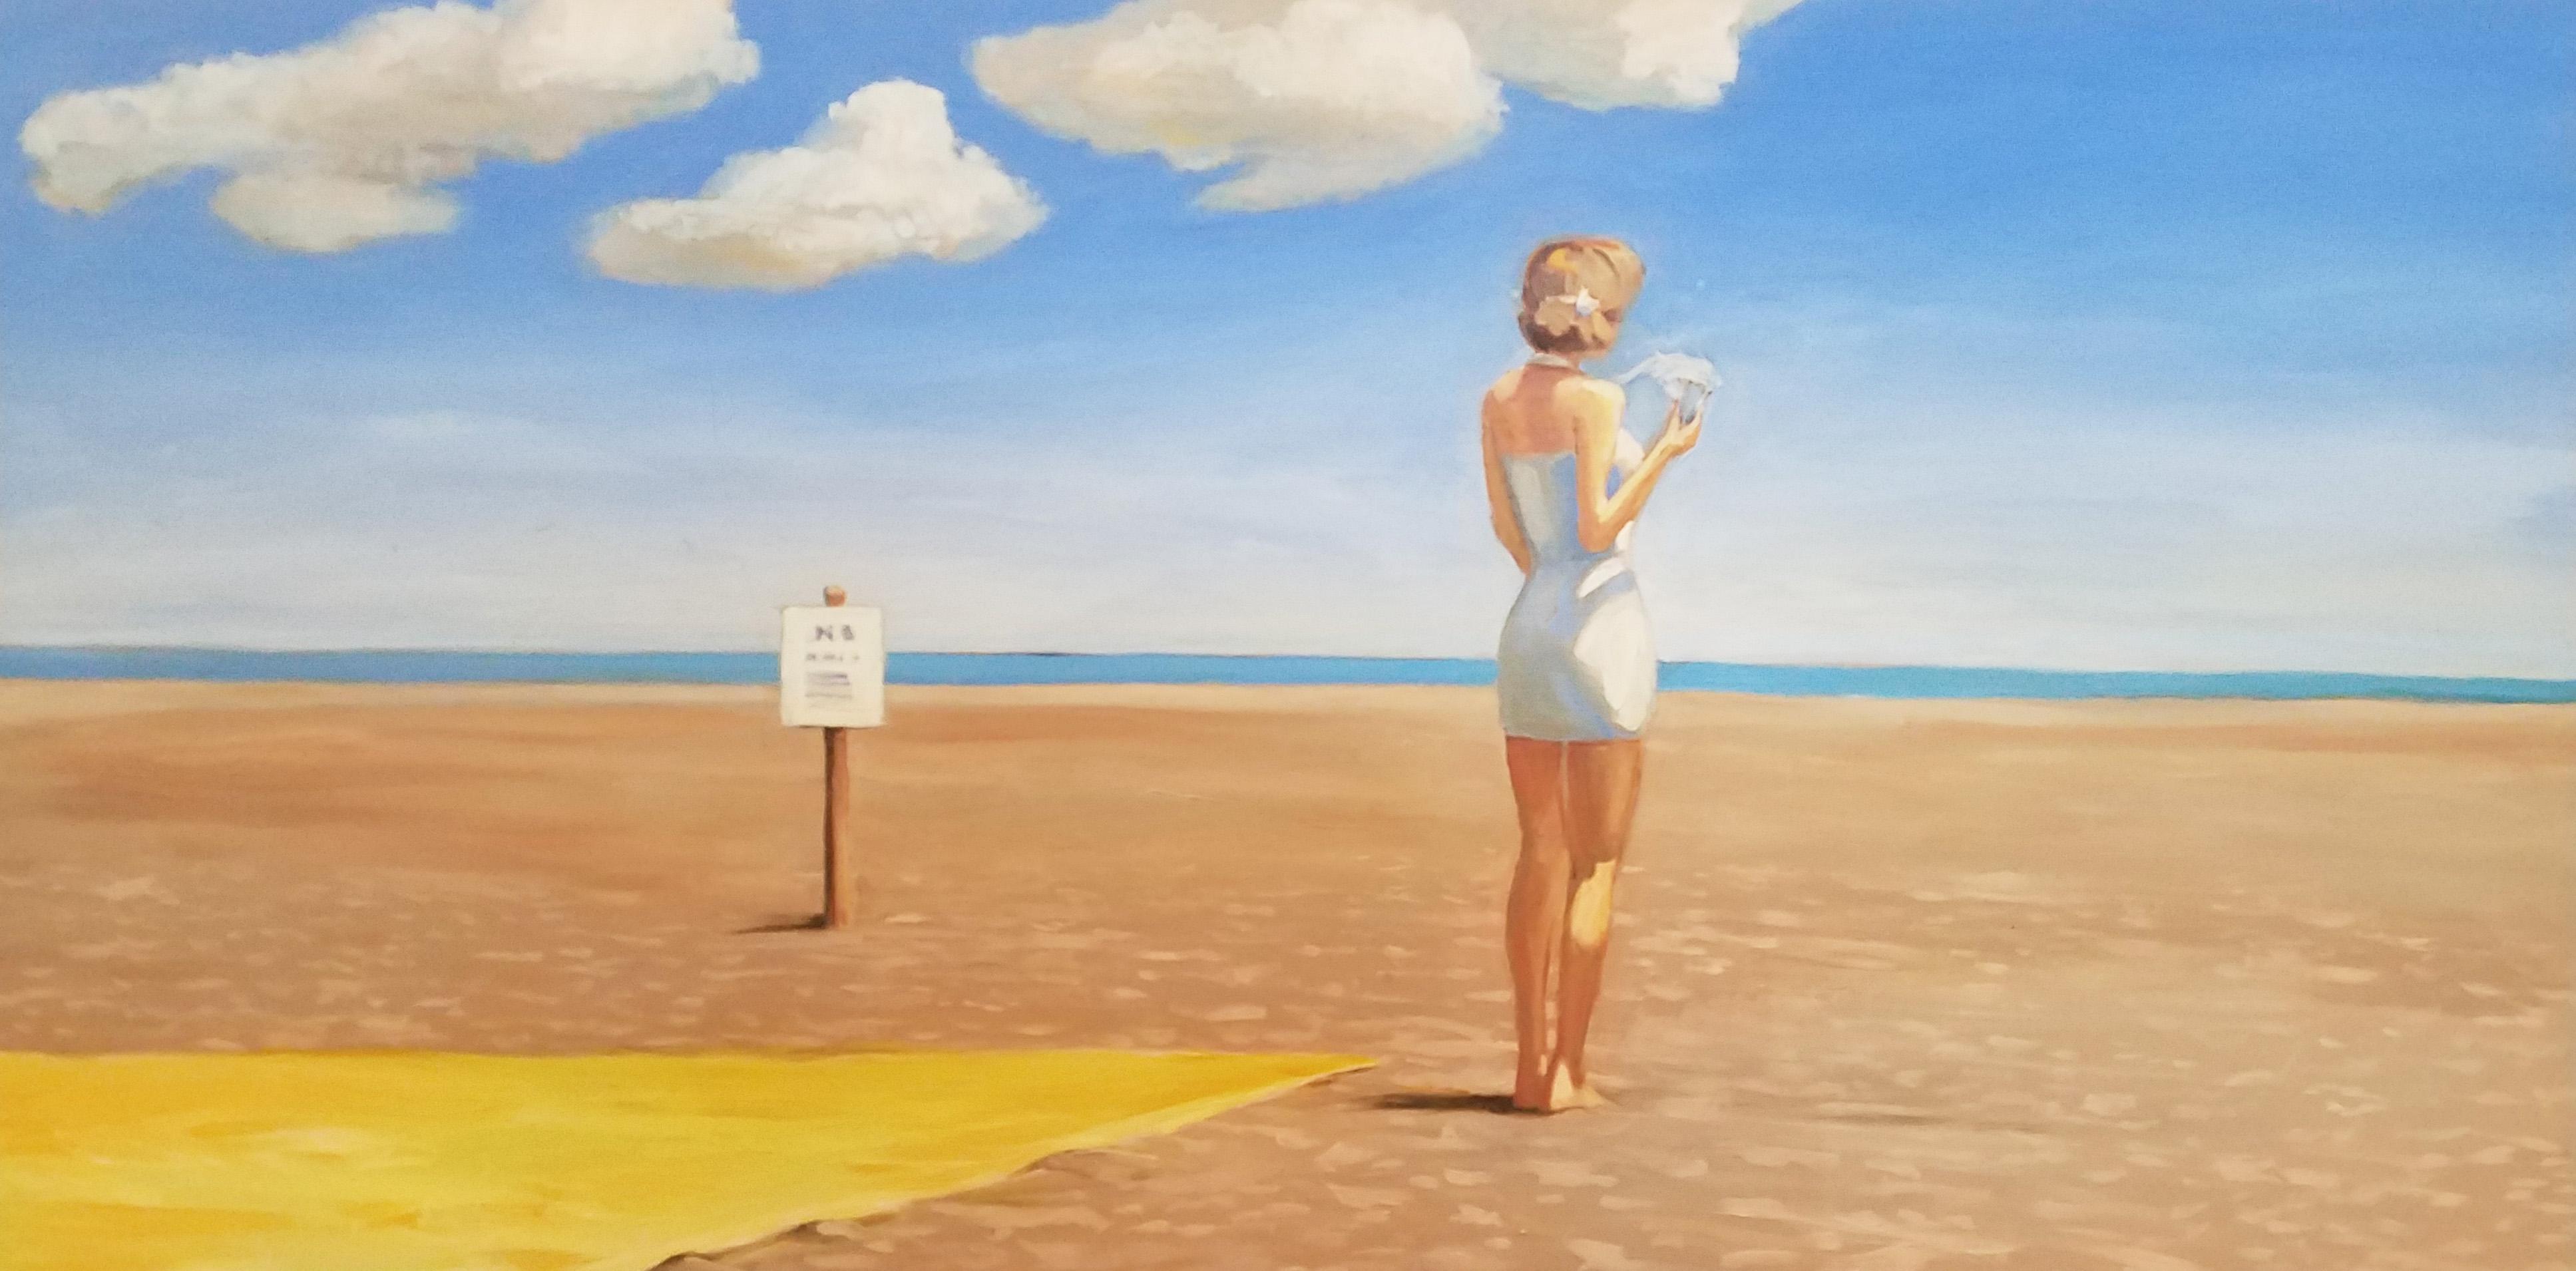 Kerry Rowland-Avrech